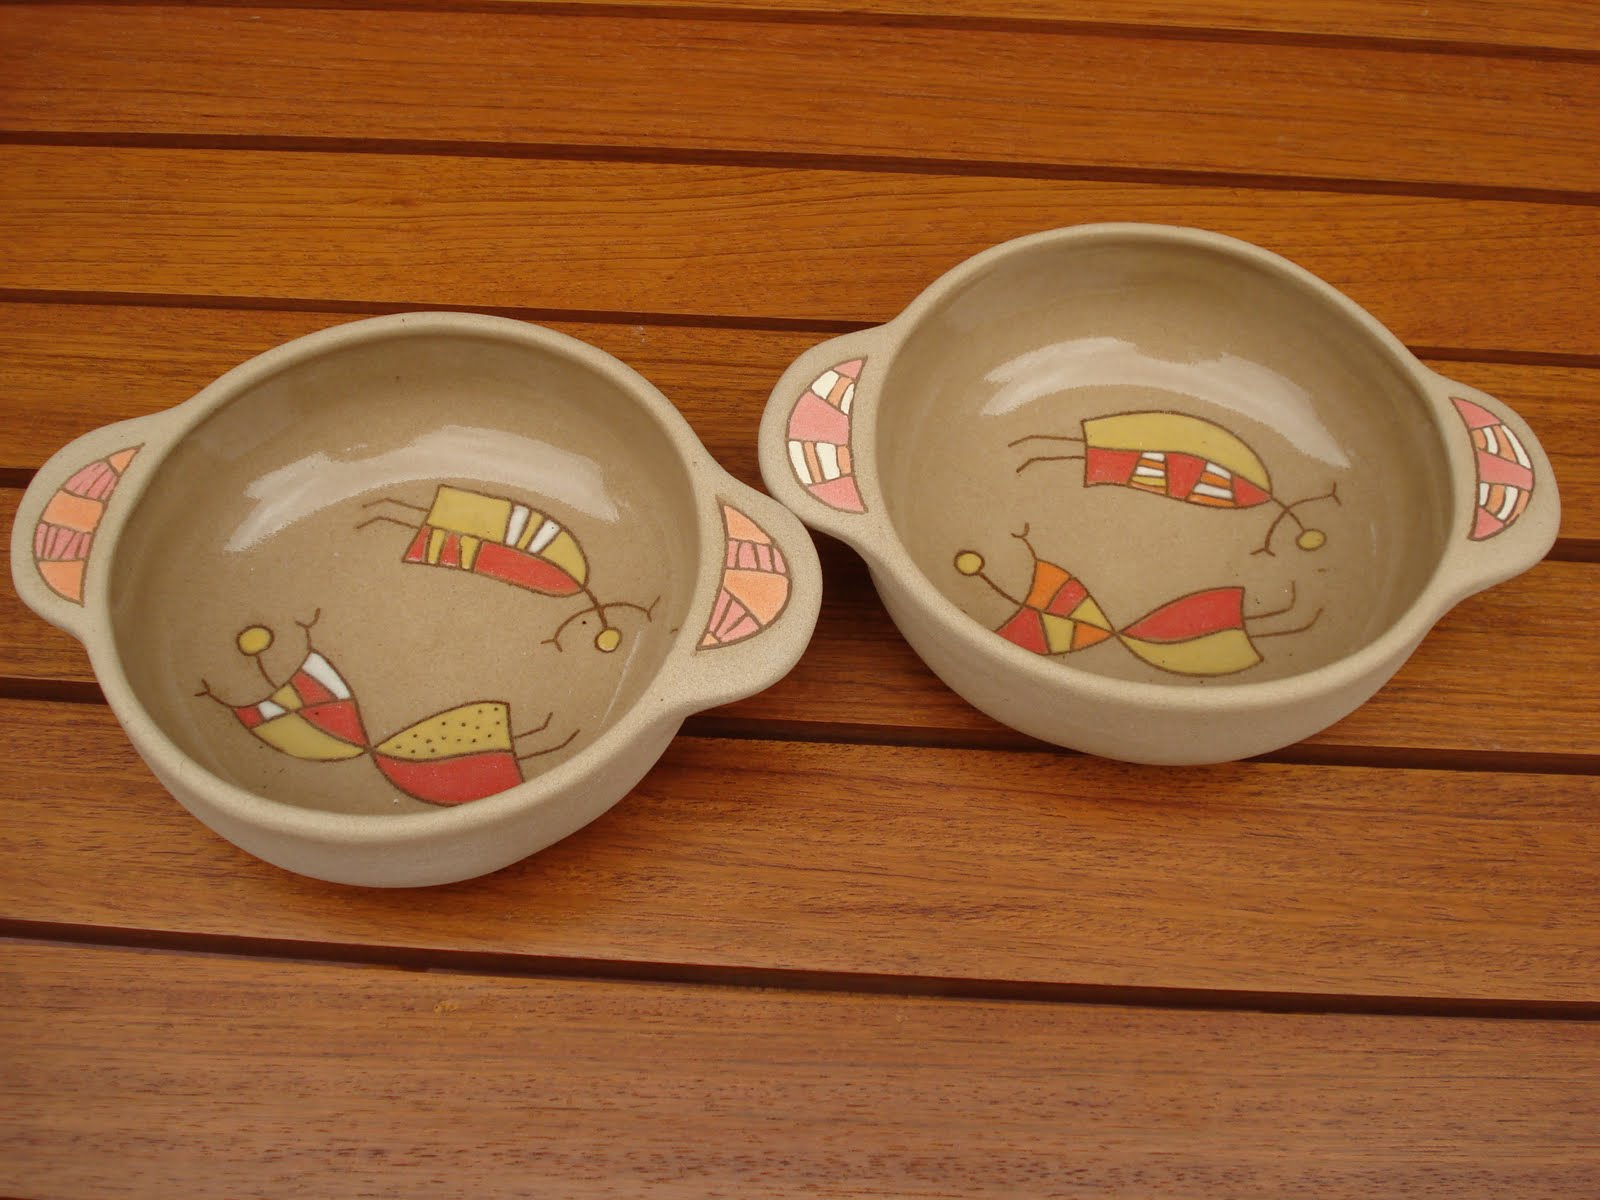 Ceramica El Cuenco Linea Tostada